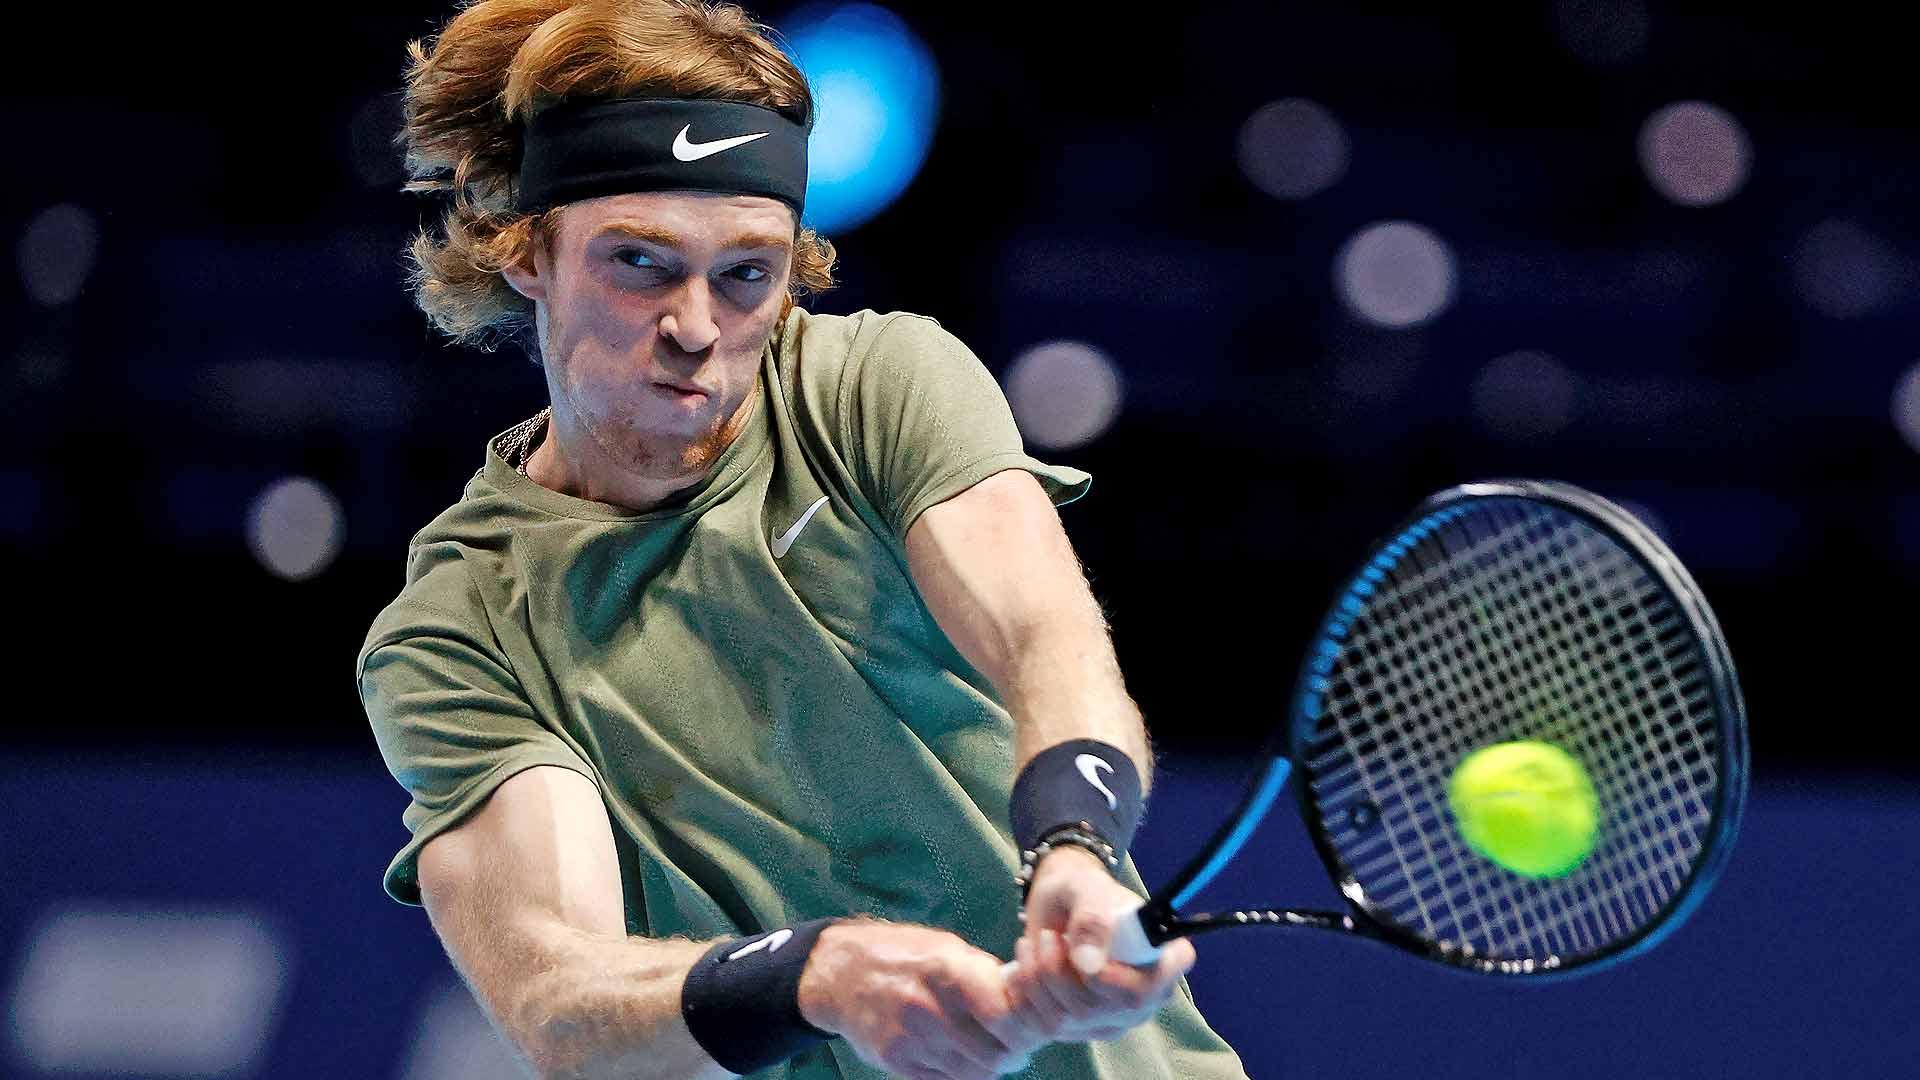 Qatar Open 2021: Andrey Rublev vs. Marton Fucsovics Tennis Preview and Prediction